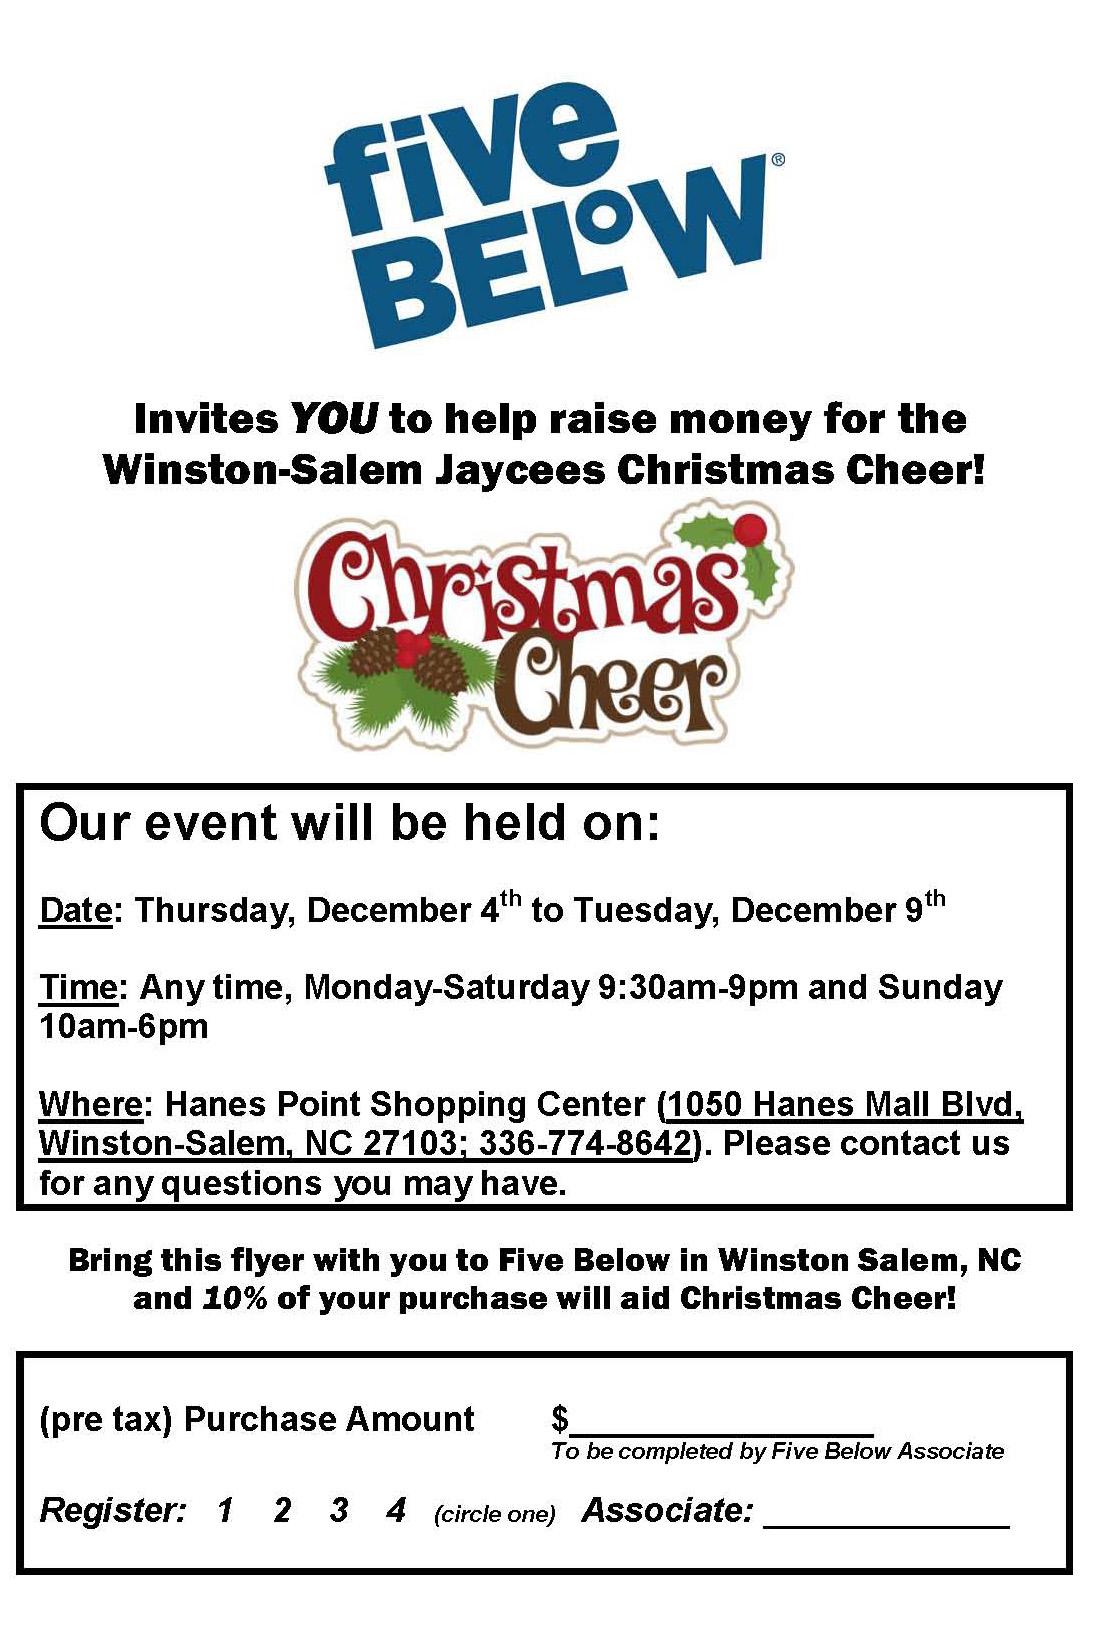 Christmas Fundraiser Flyer.5 Below Fundraiser For Christmas Cheer 2014 12 04